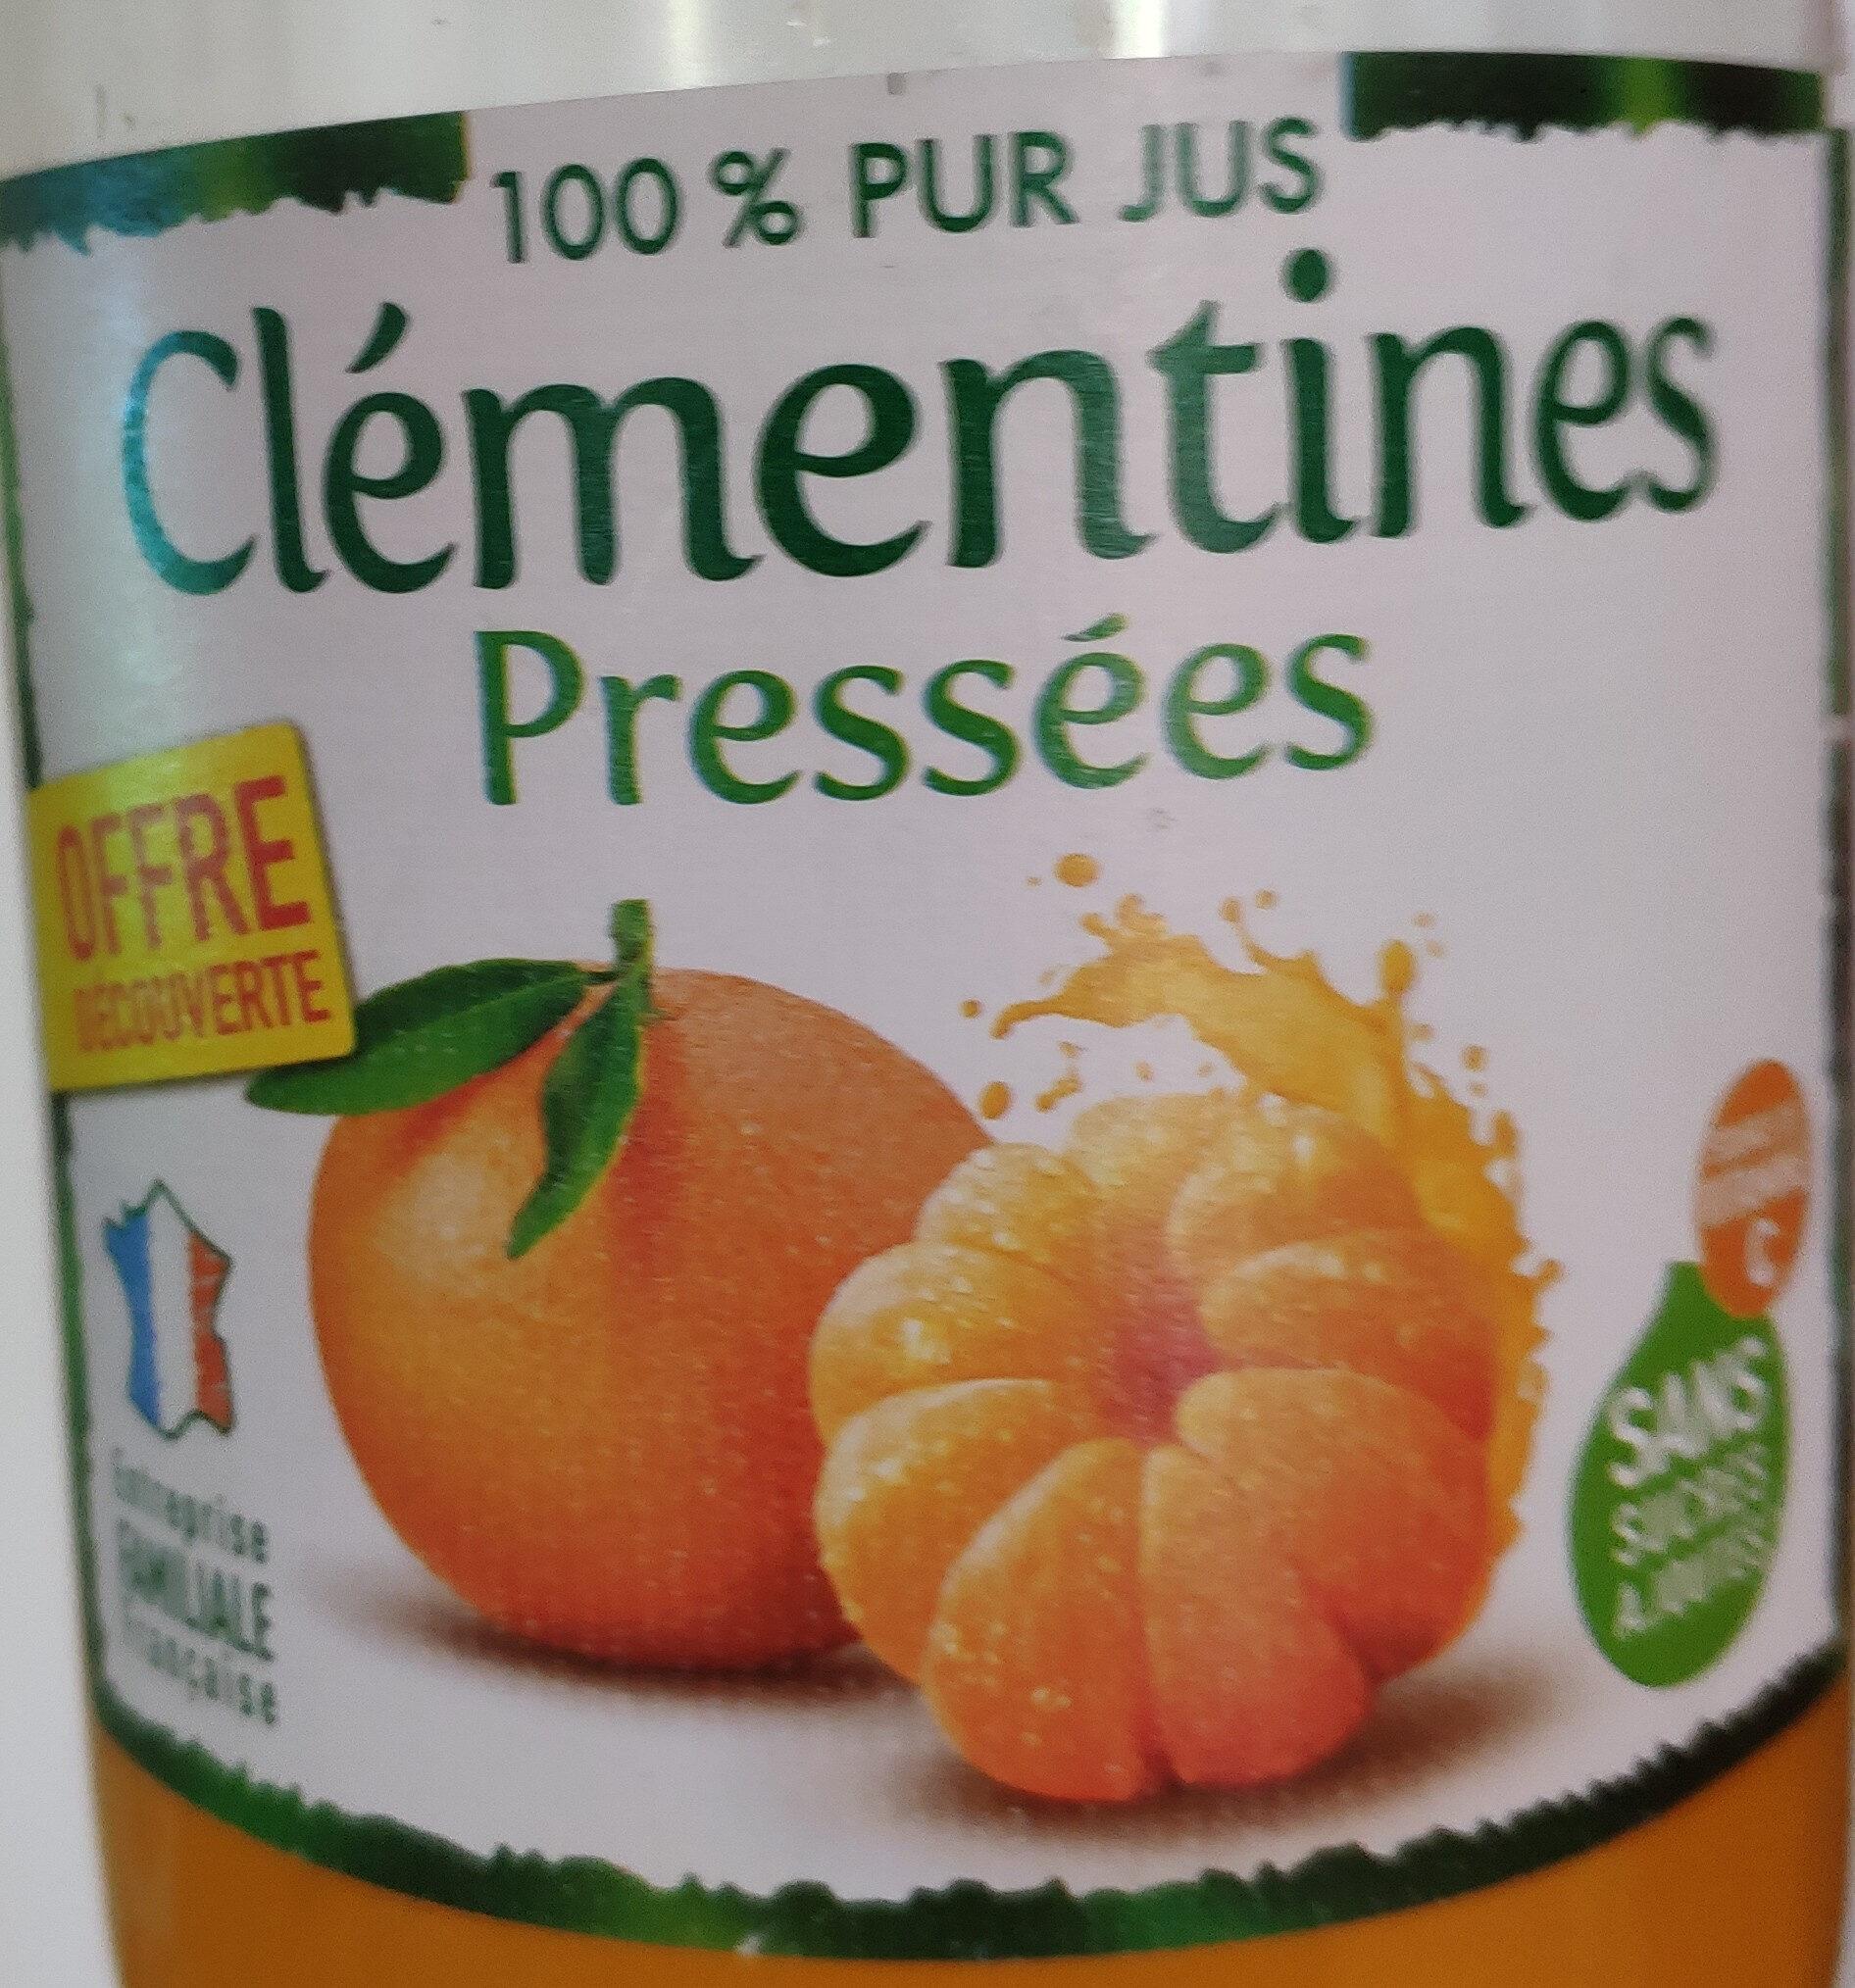 Clémentines pressées - Produit - fr